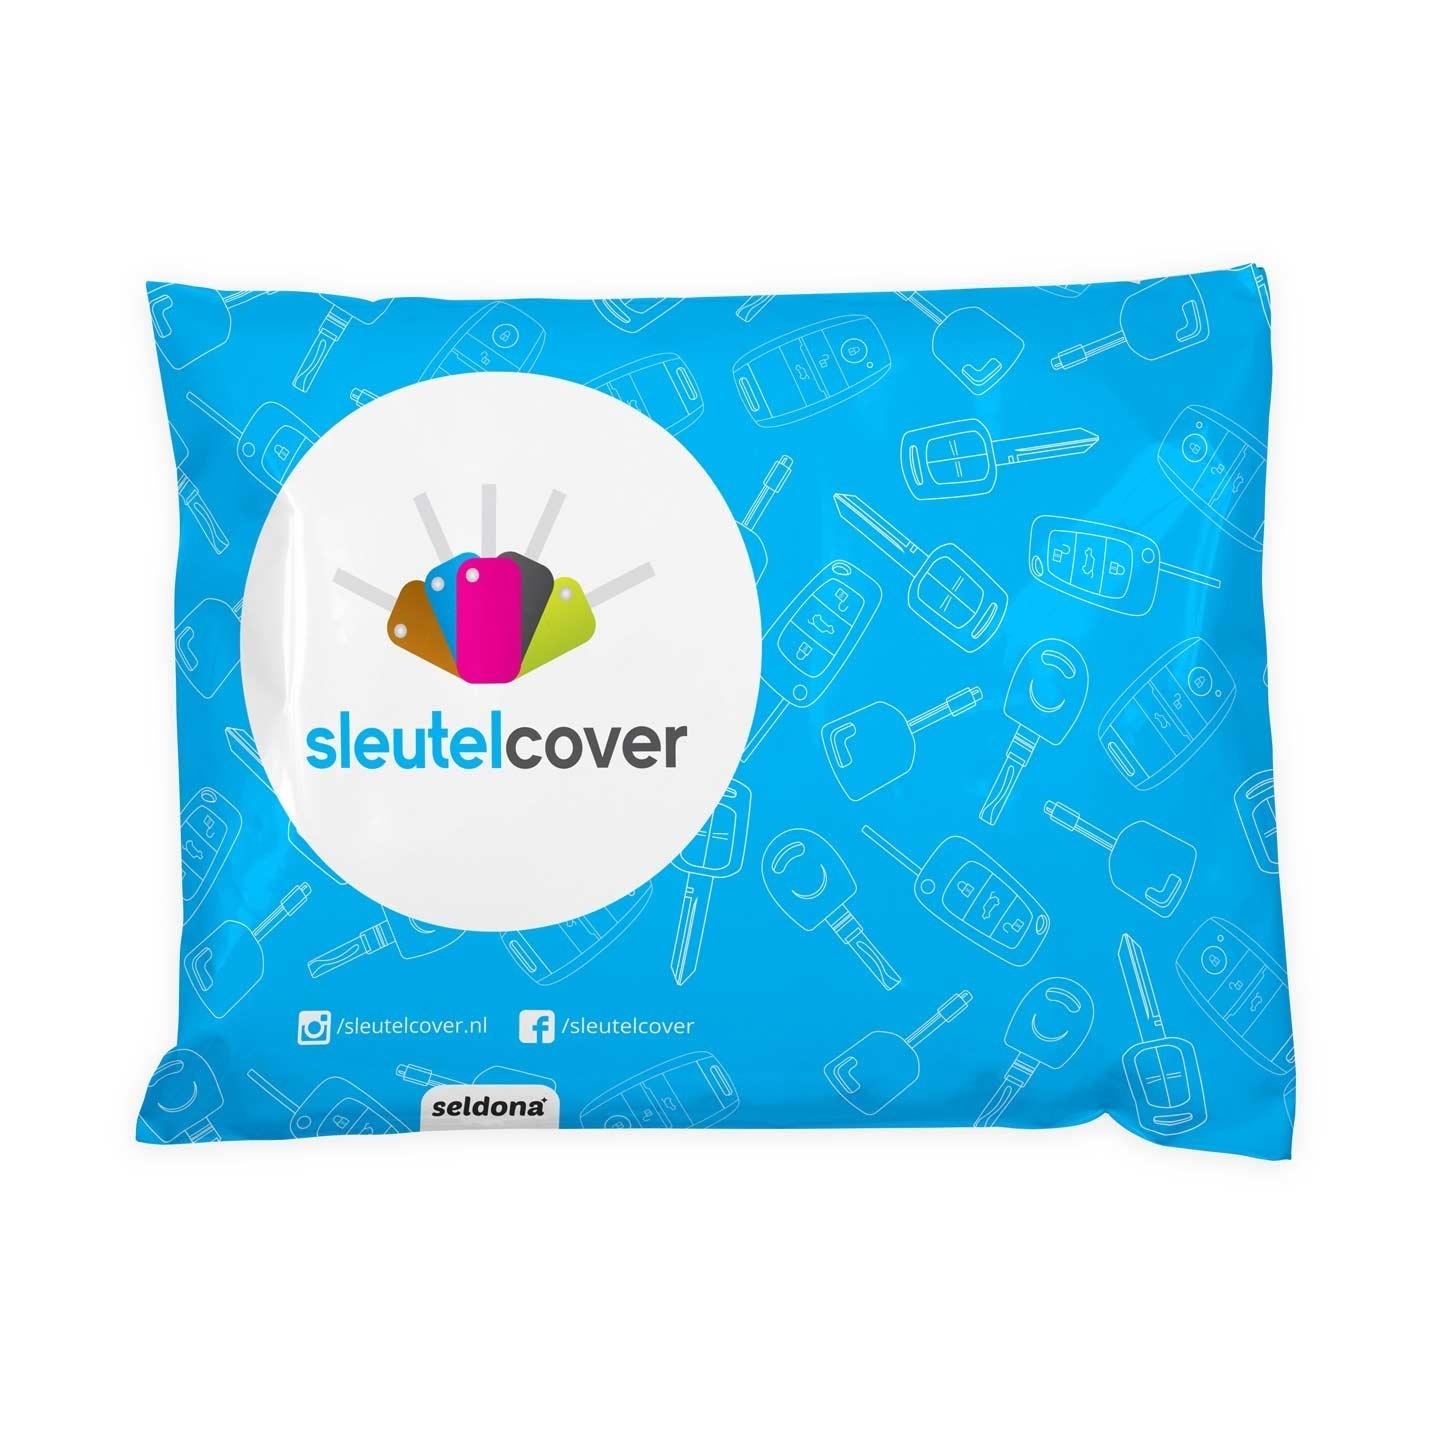 Ford SleutelCover - Lichtblauw / Silicone sleutelhoesje / beschermhoesje autosleutel